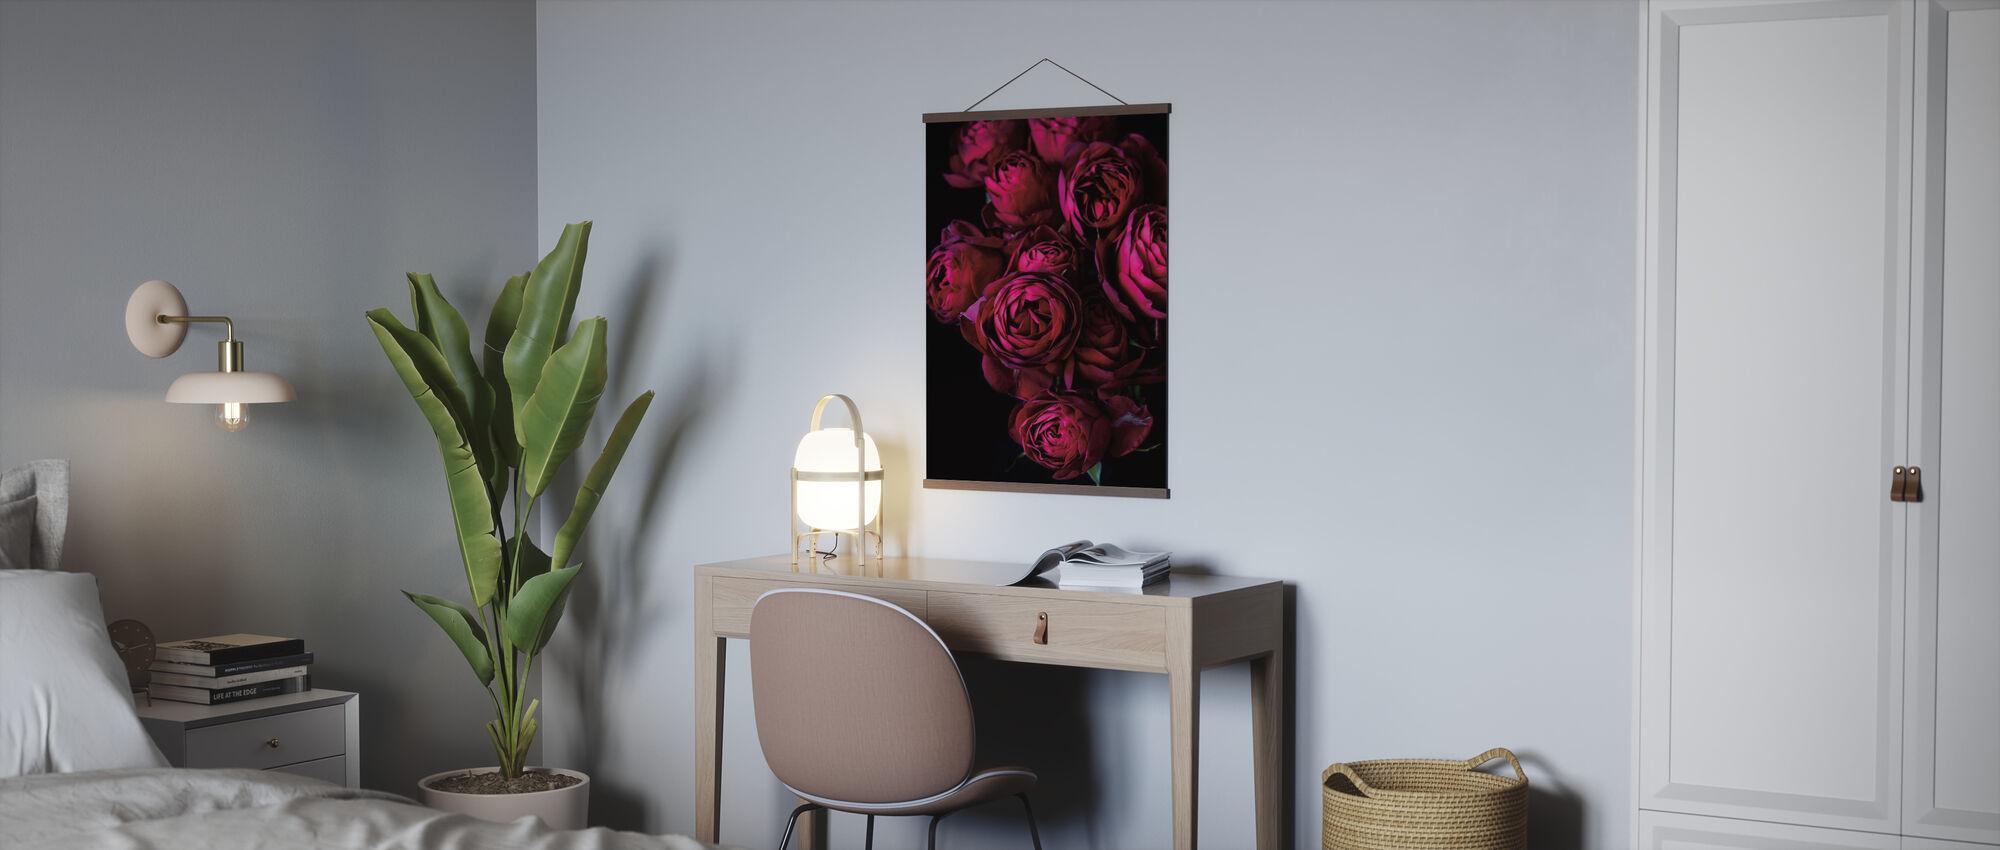 Roses de chou - Affiche - Bureau